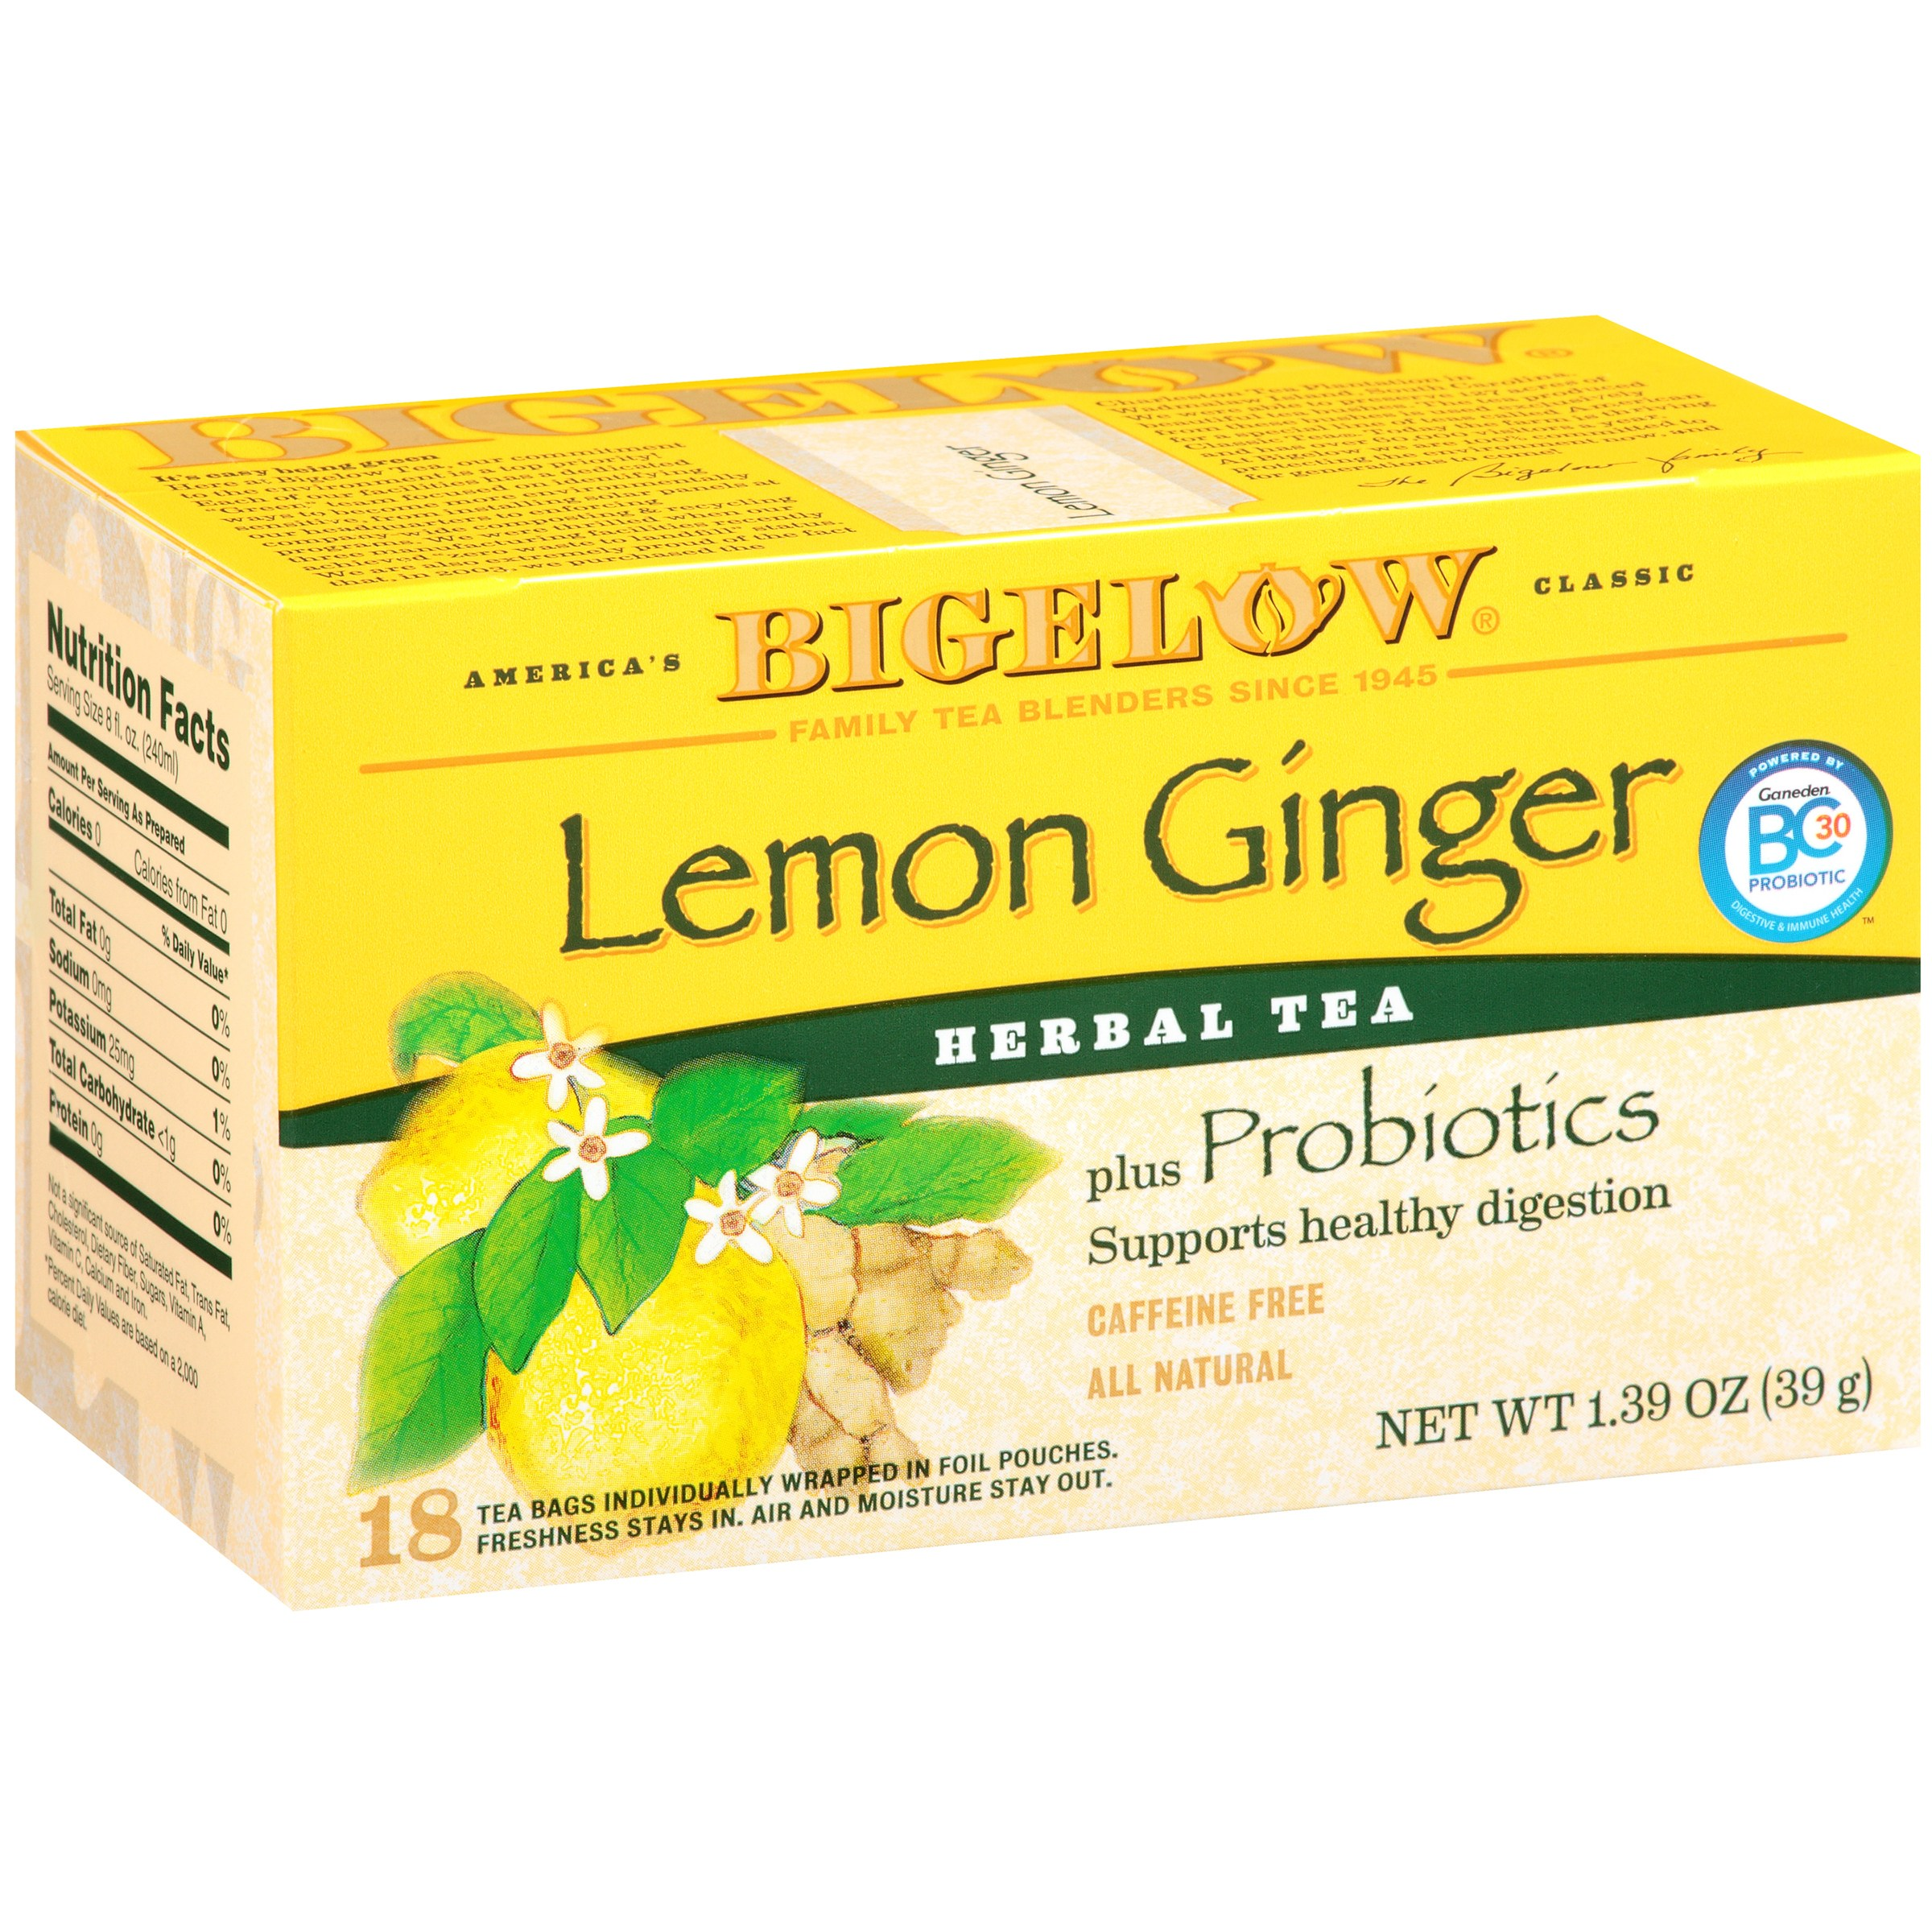 Bigelow Herbal Tea Bags Plus Probiotics Lemon Ginger 18 CT by RC Bigelow, Inc.